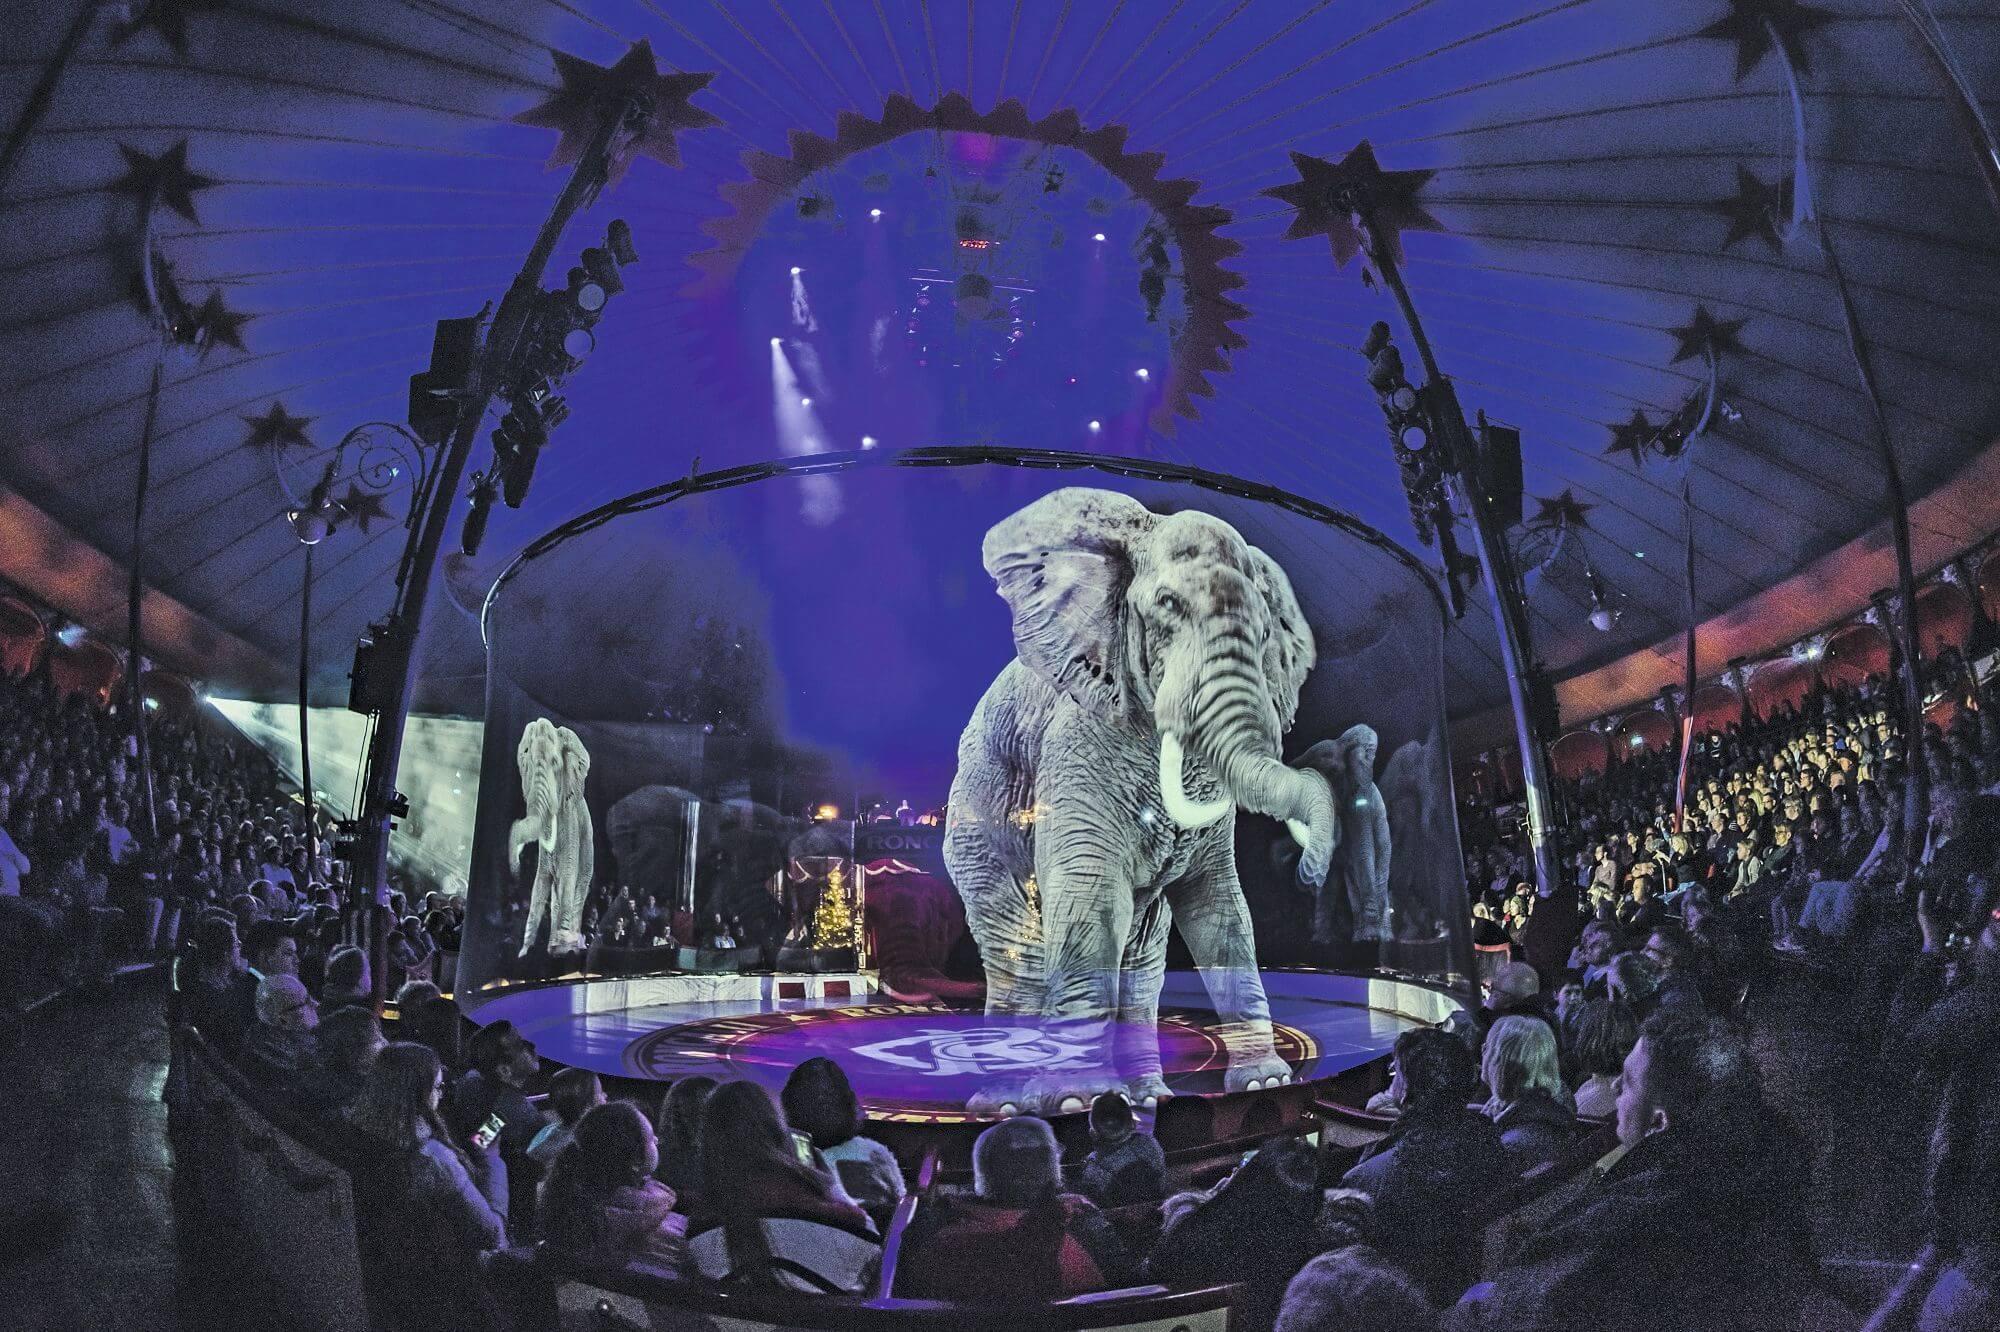 https://hologramme.org/wp-content/uploads/2019/09/Hologrammes-Cirque.jpg